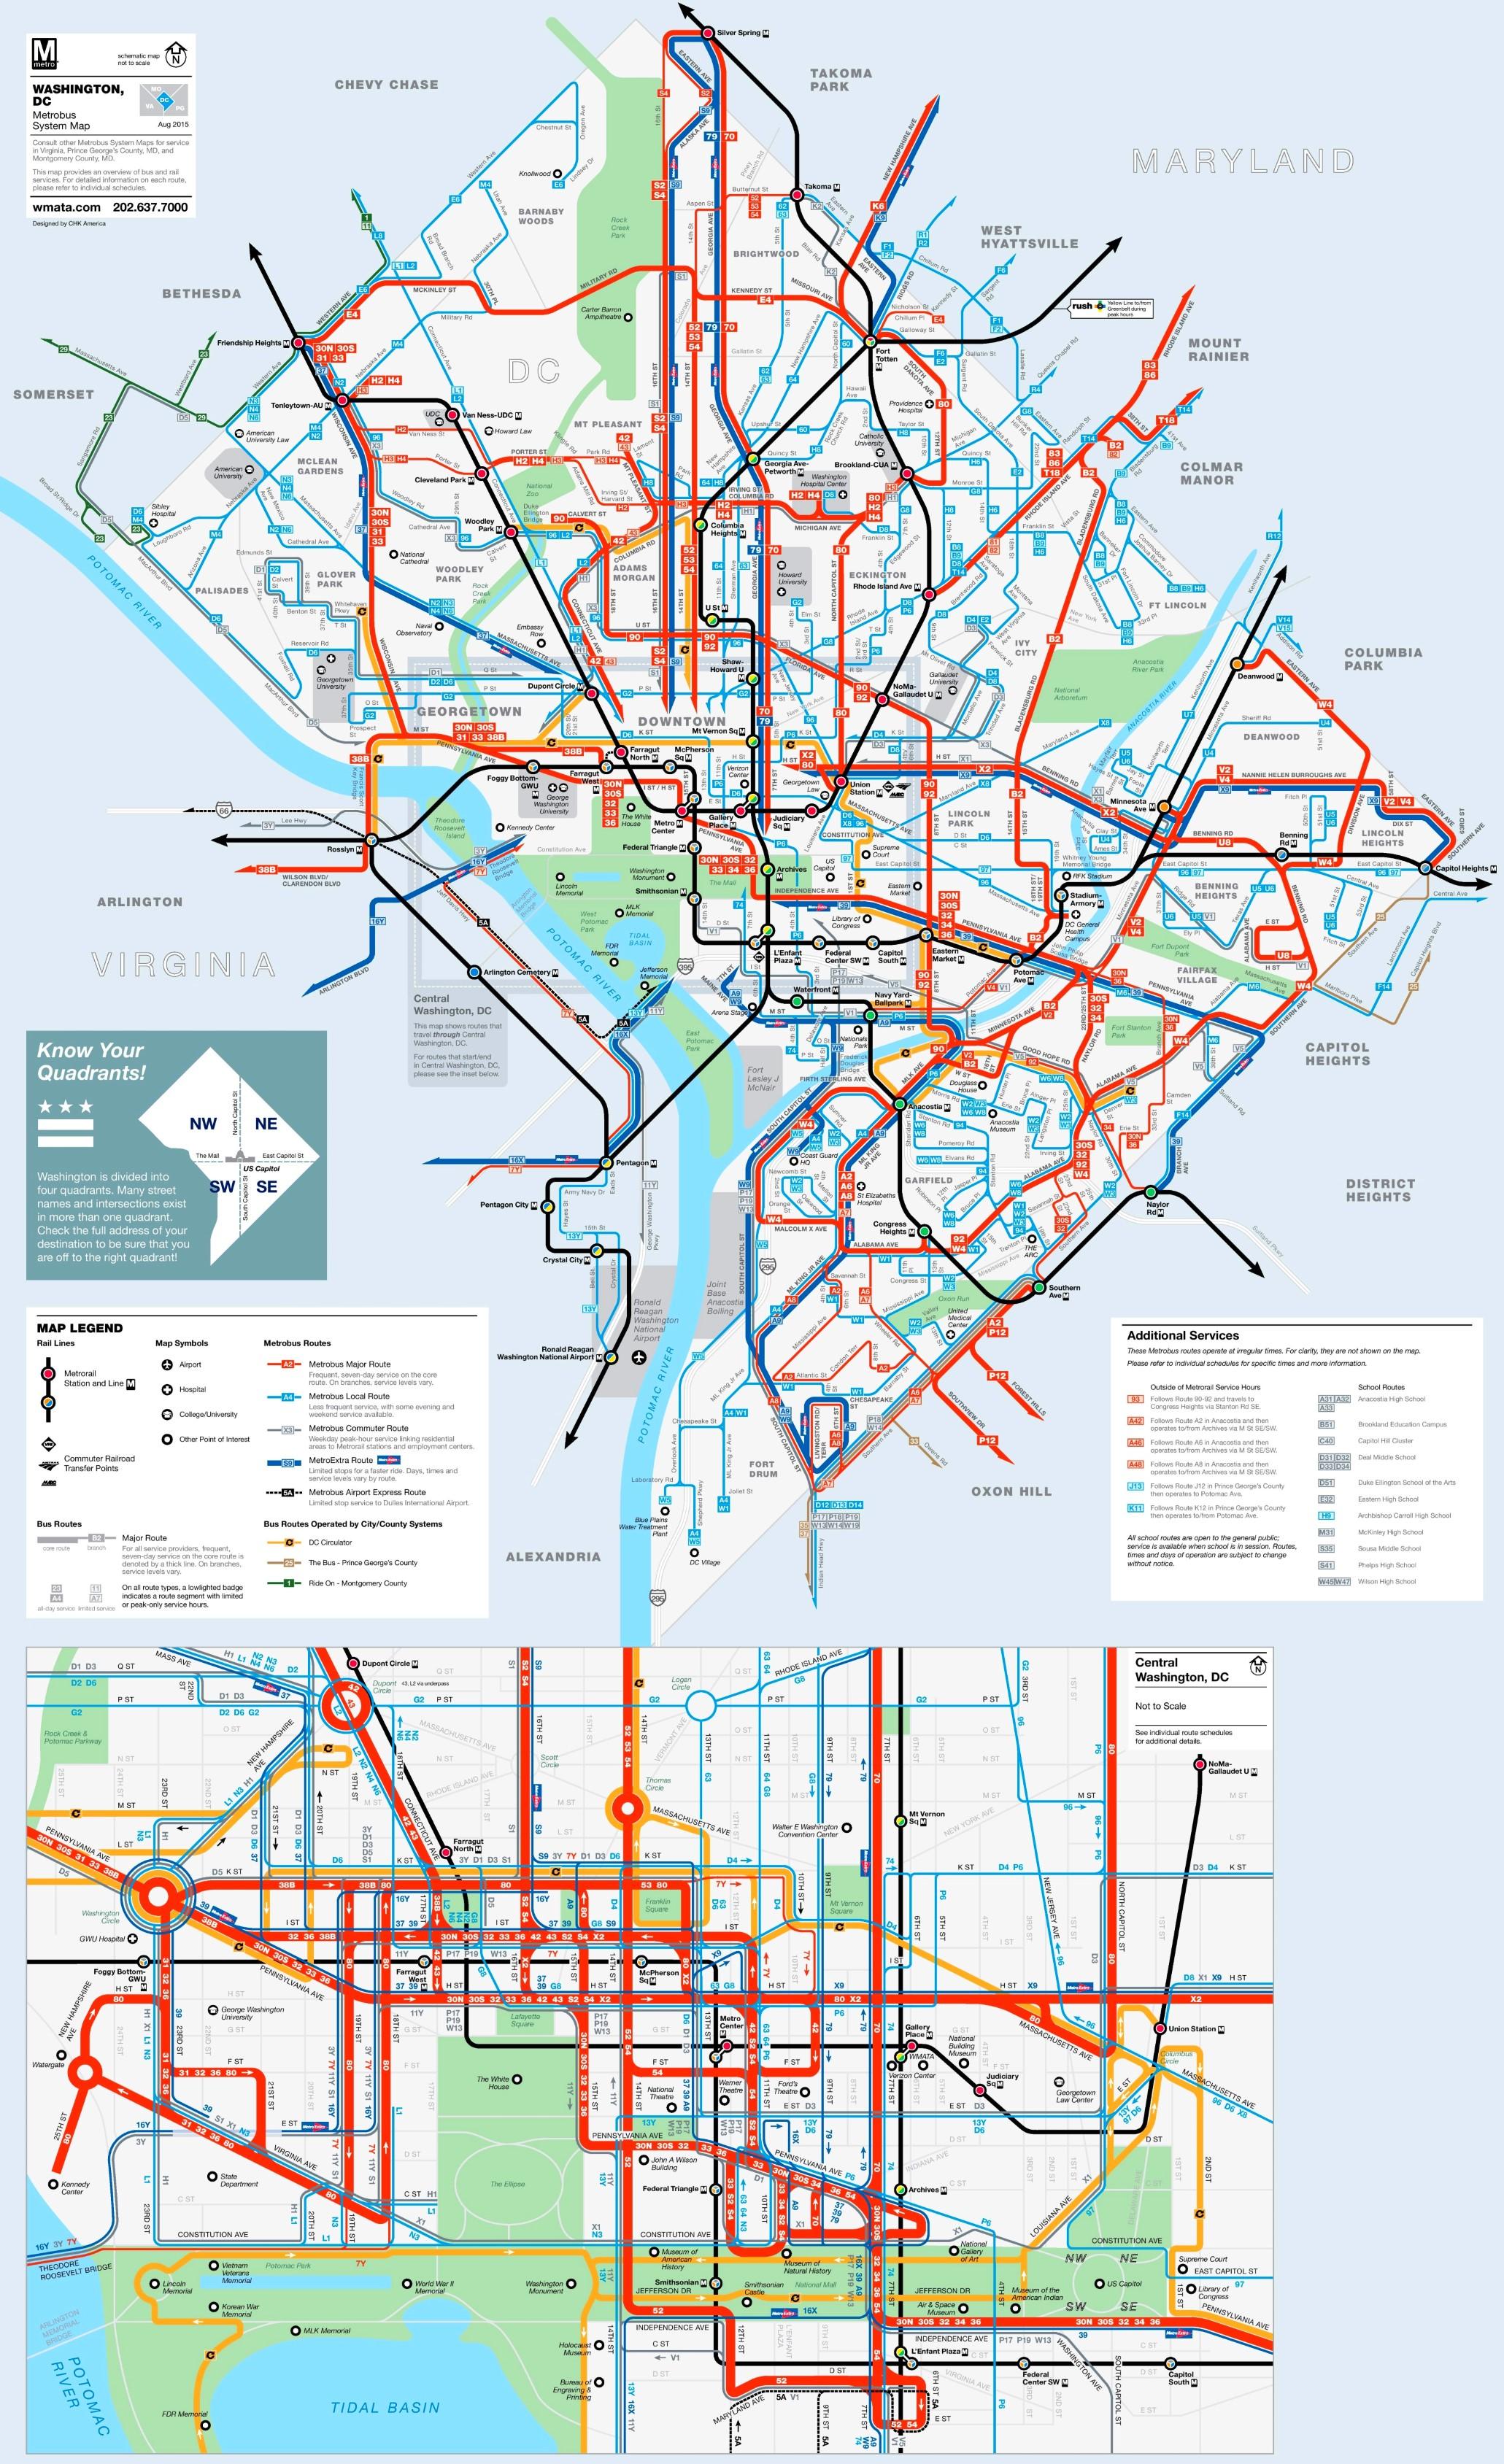 It's just a photo of Printable Washington Dc Metro Map inside tourist